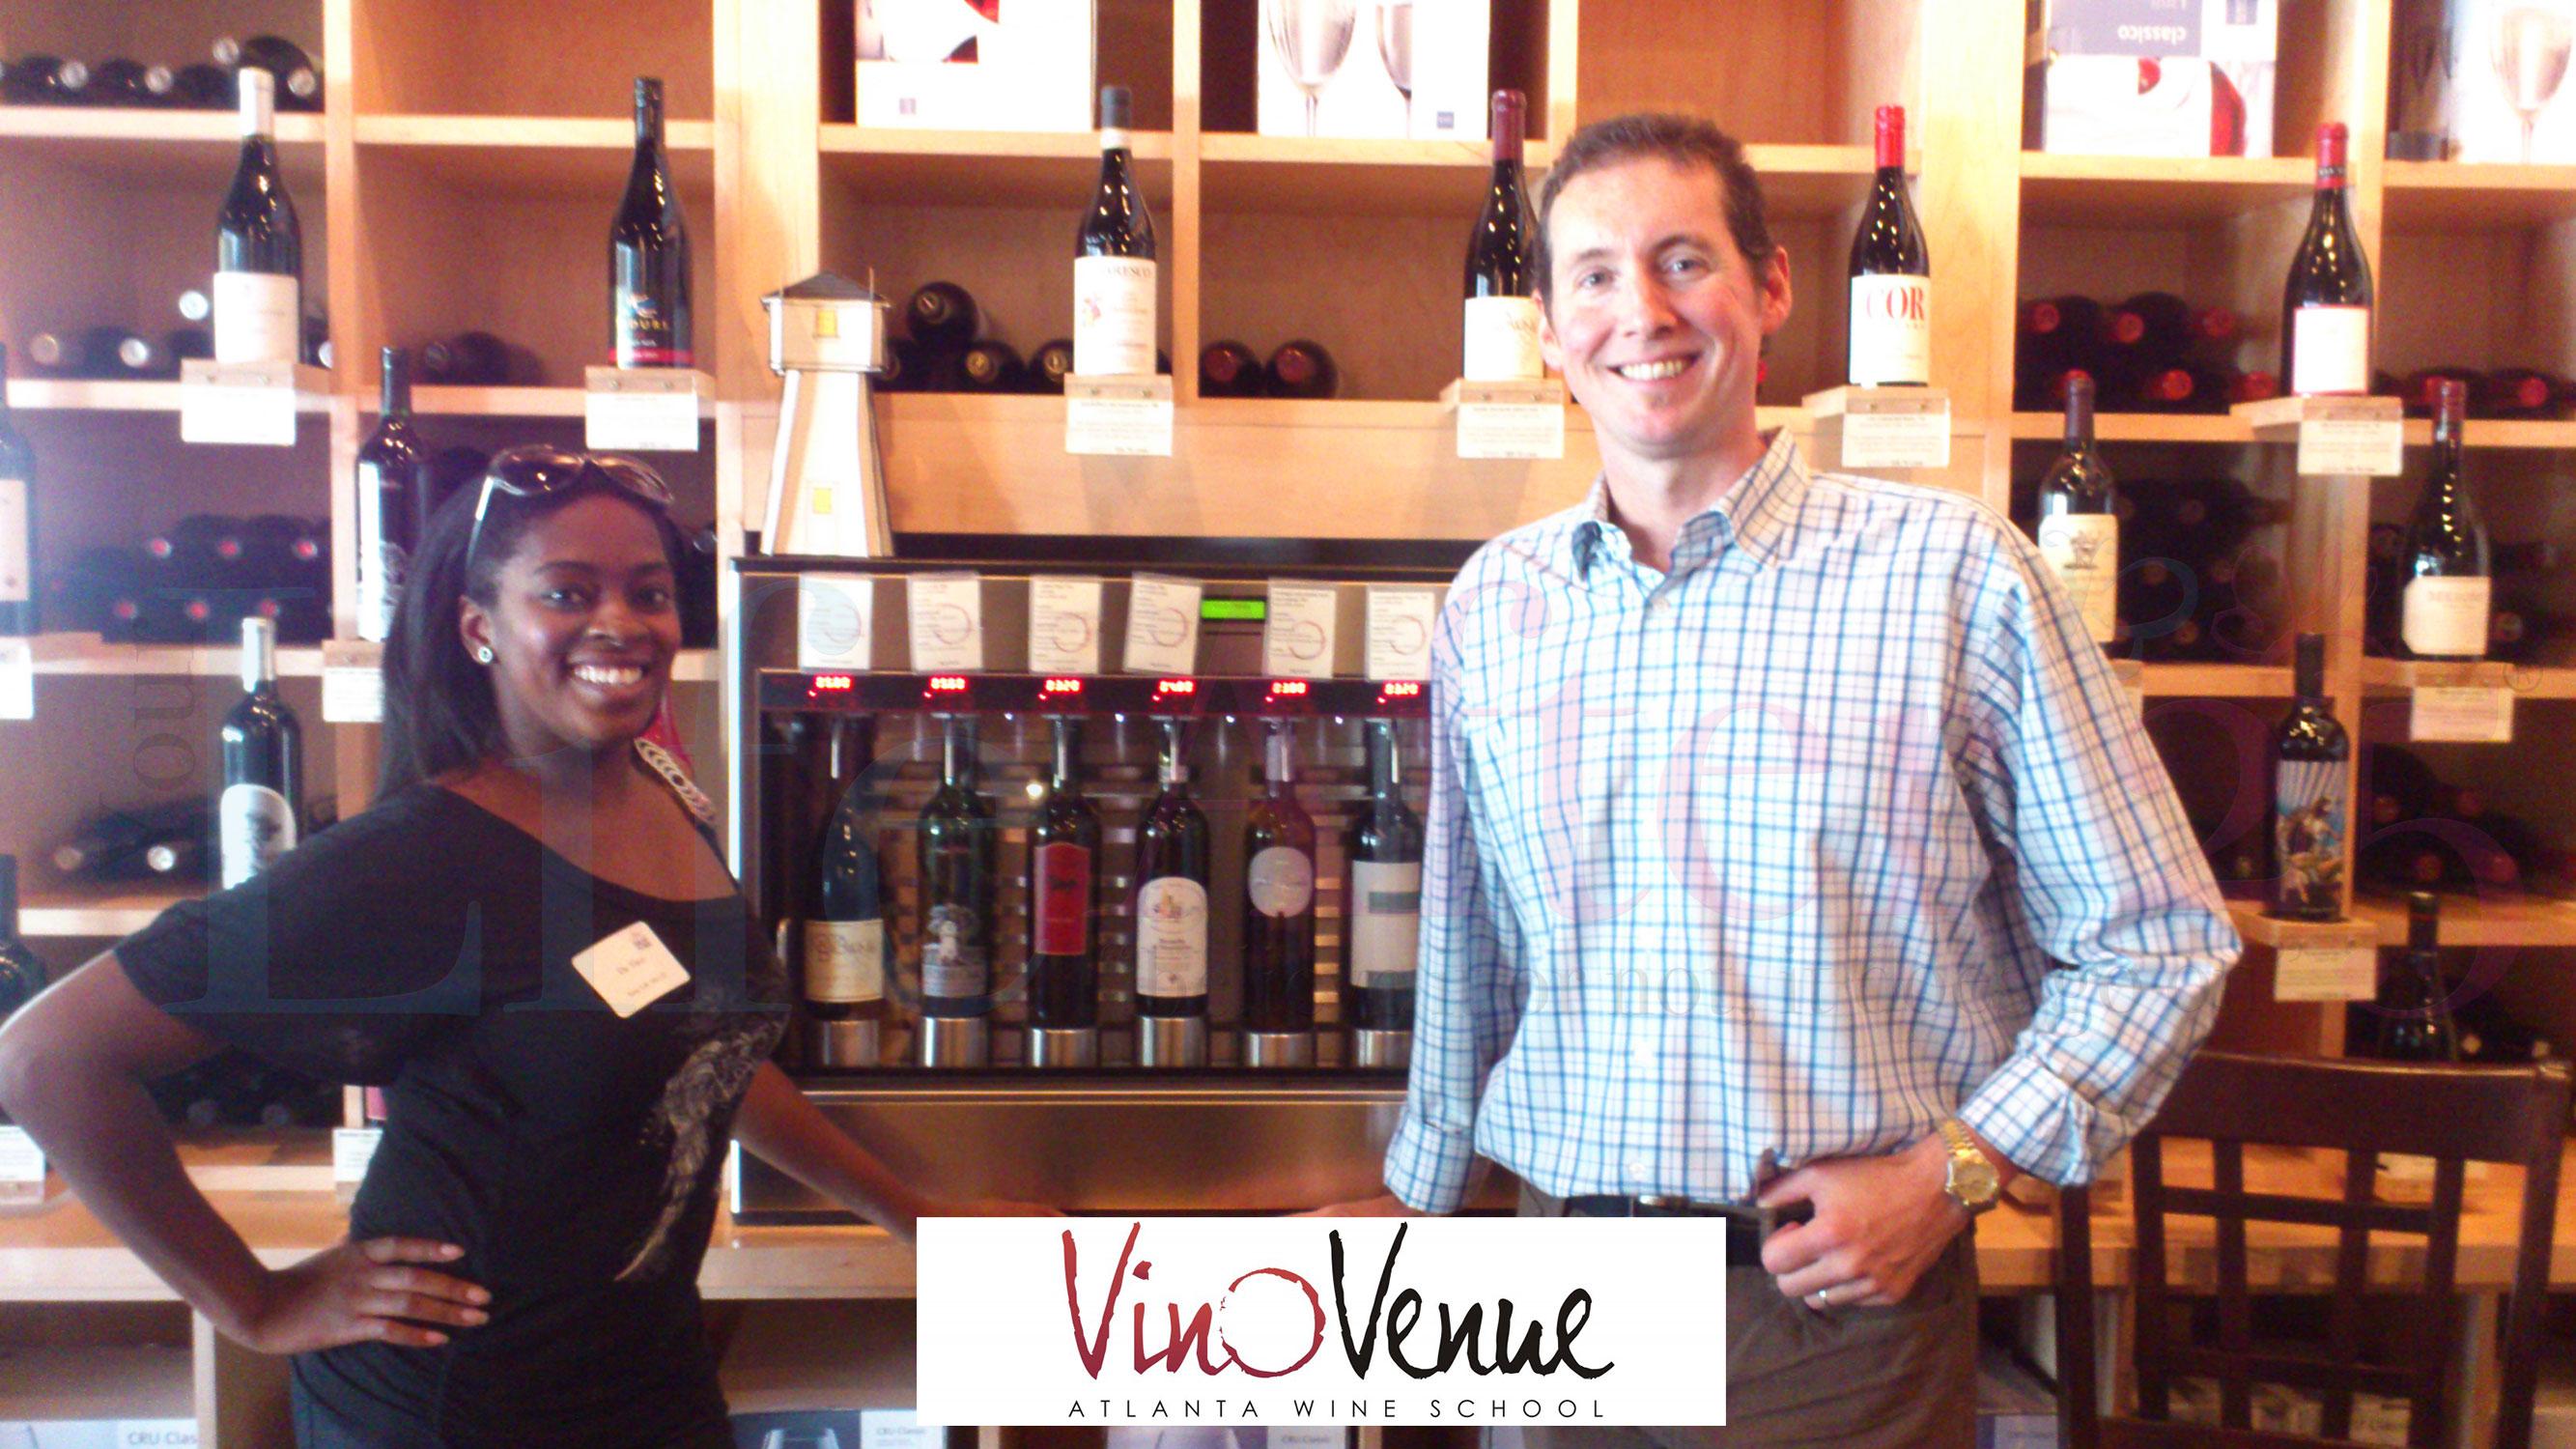 Da-Vinci-and-Michael-Bryan owner of Vino Venue Wine School Wine Bar in Atlanta